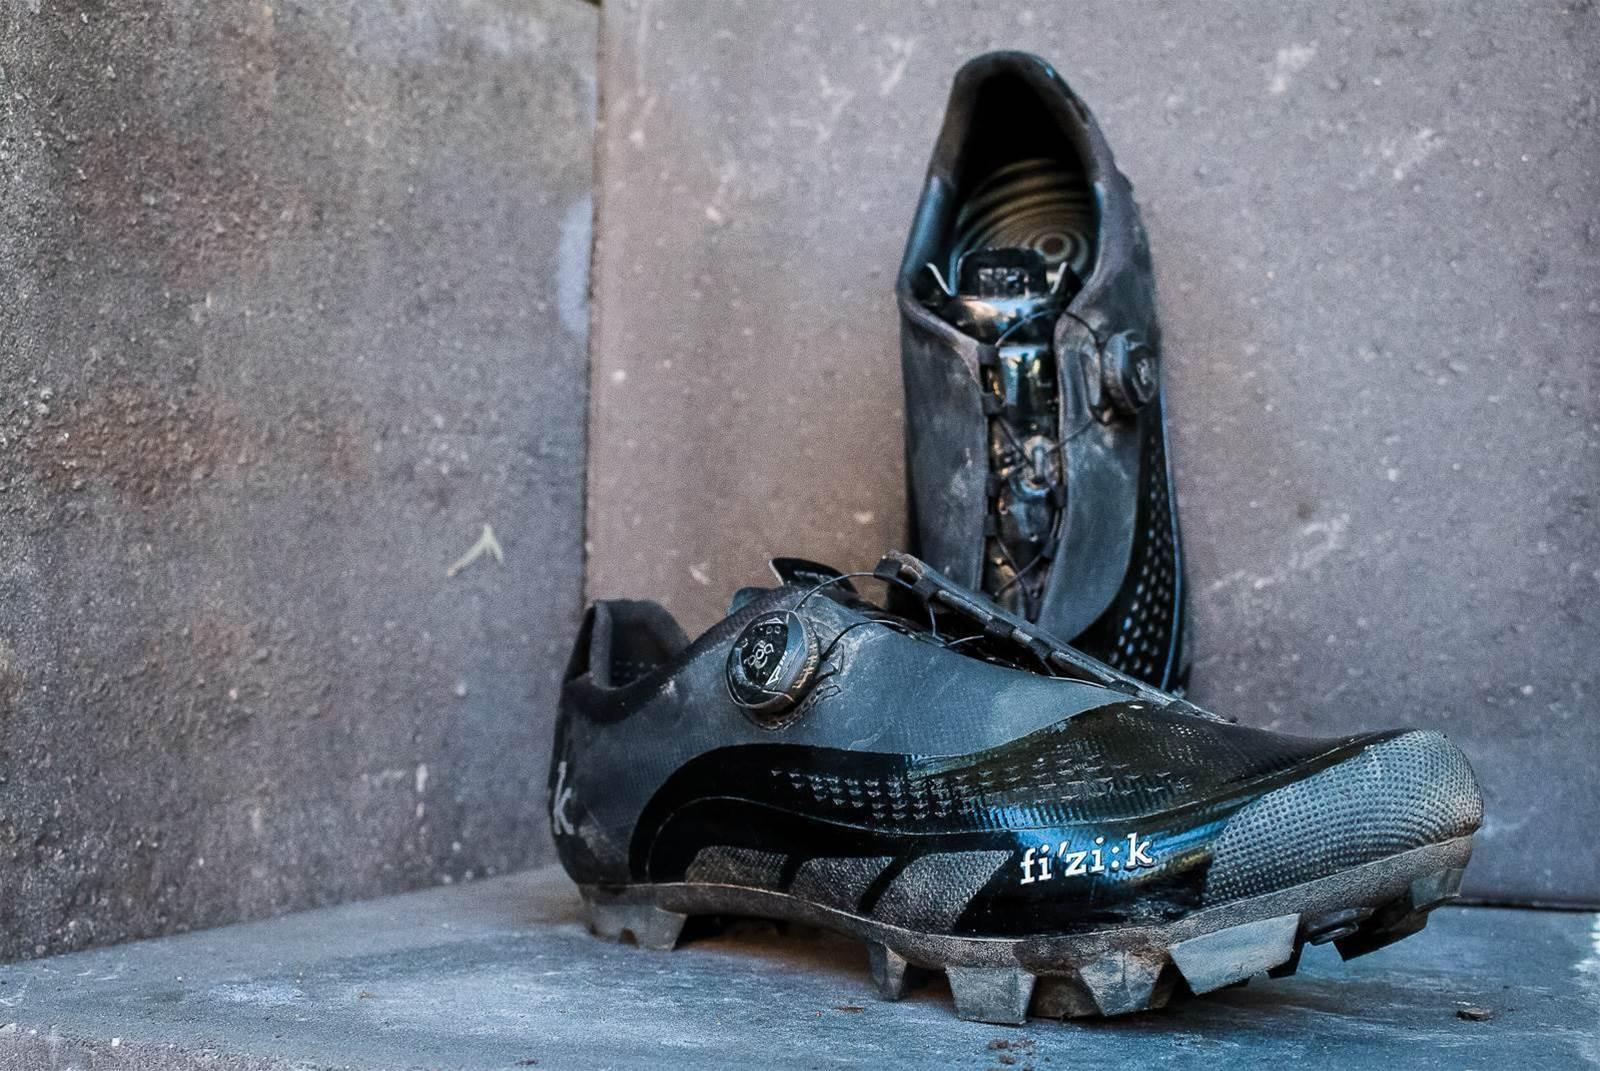 TESTED: Fi'zi:k M3B UOMO MTB shoes